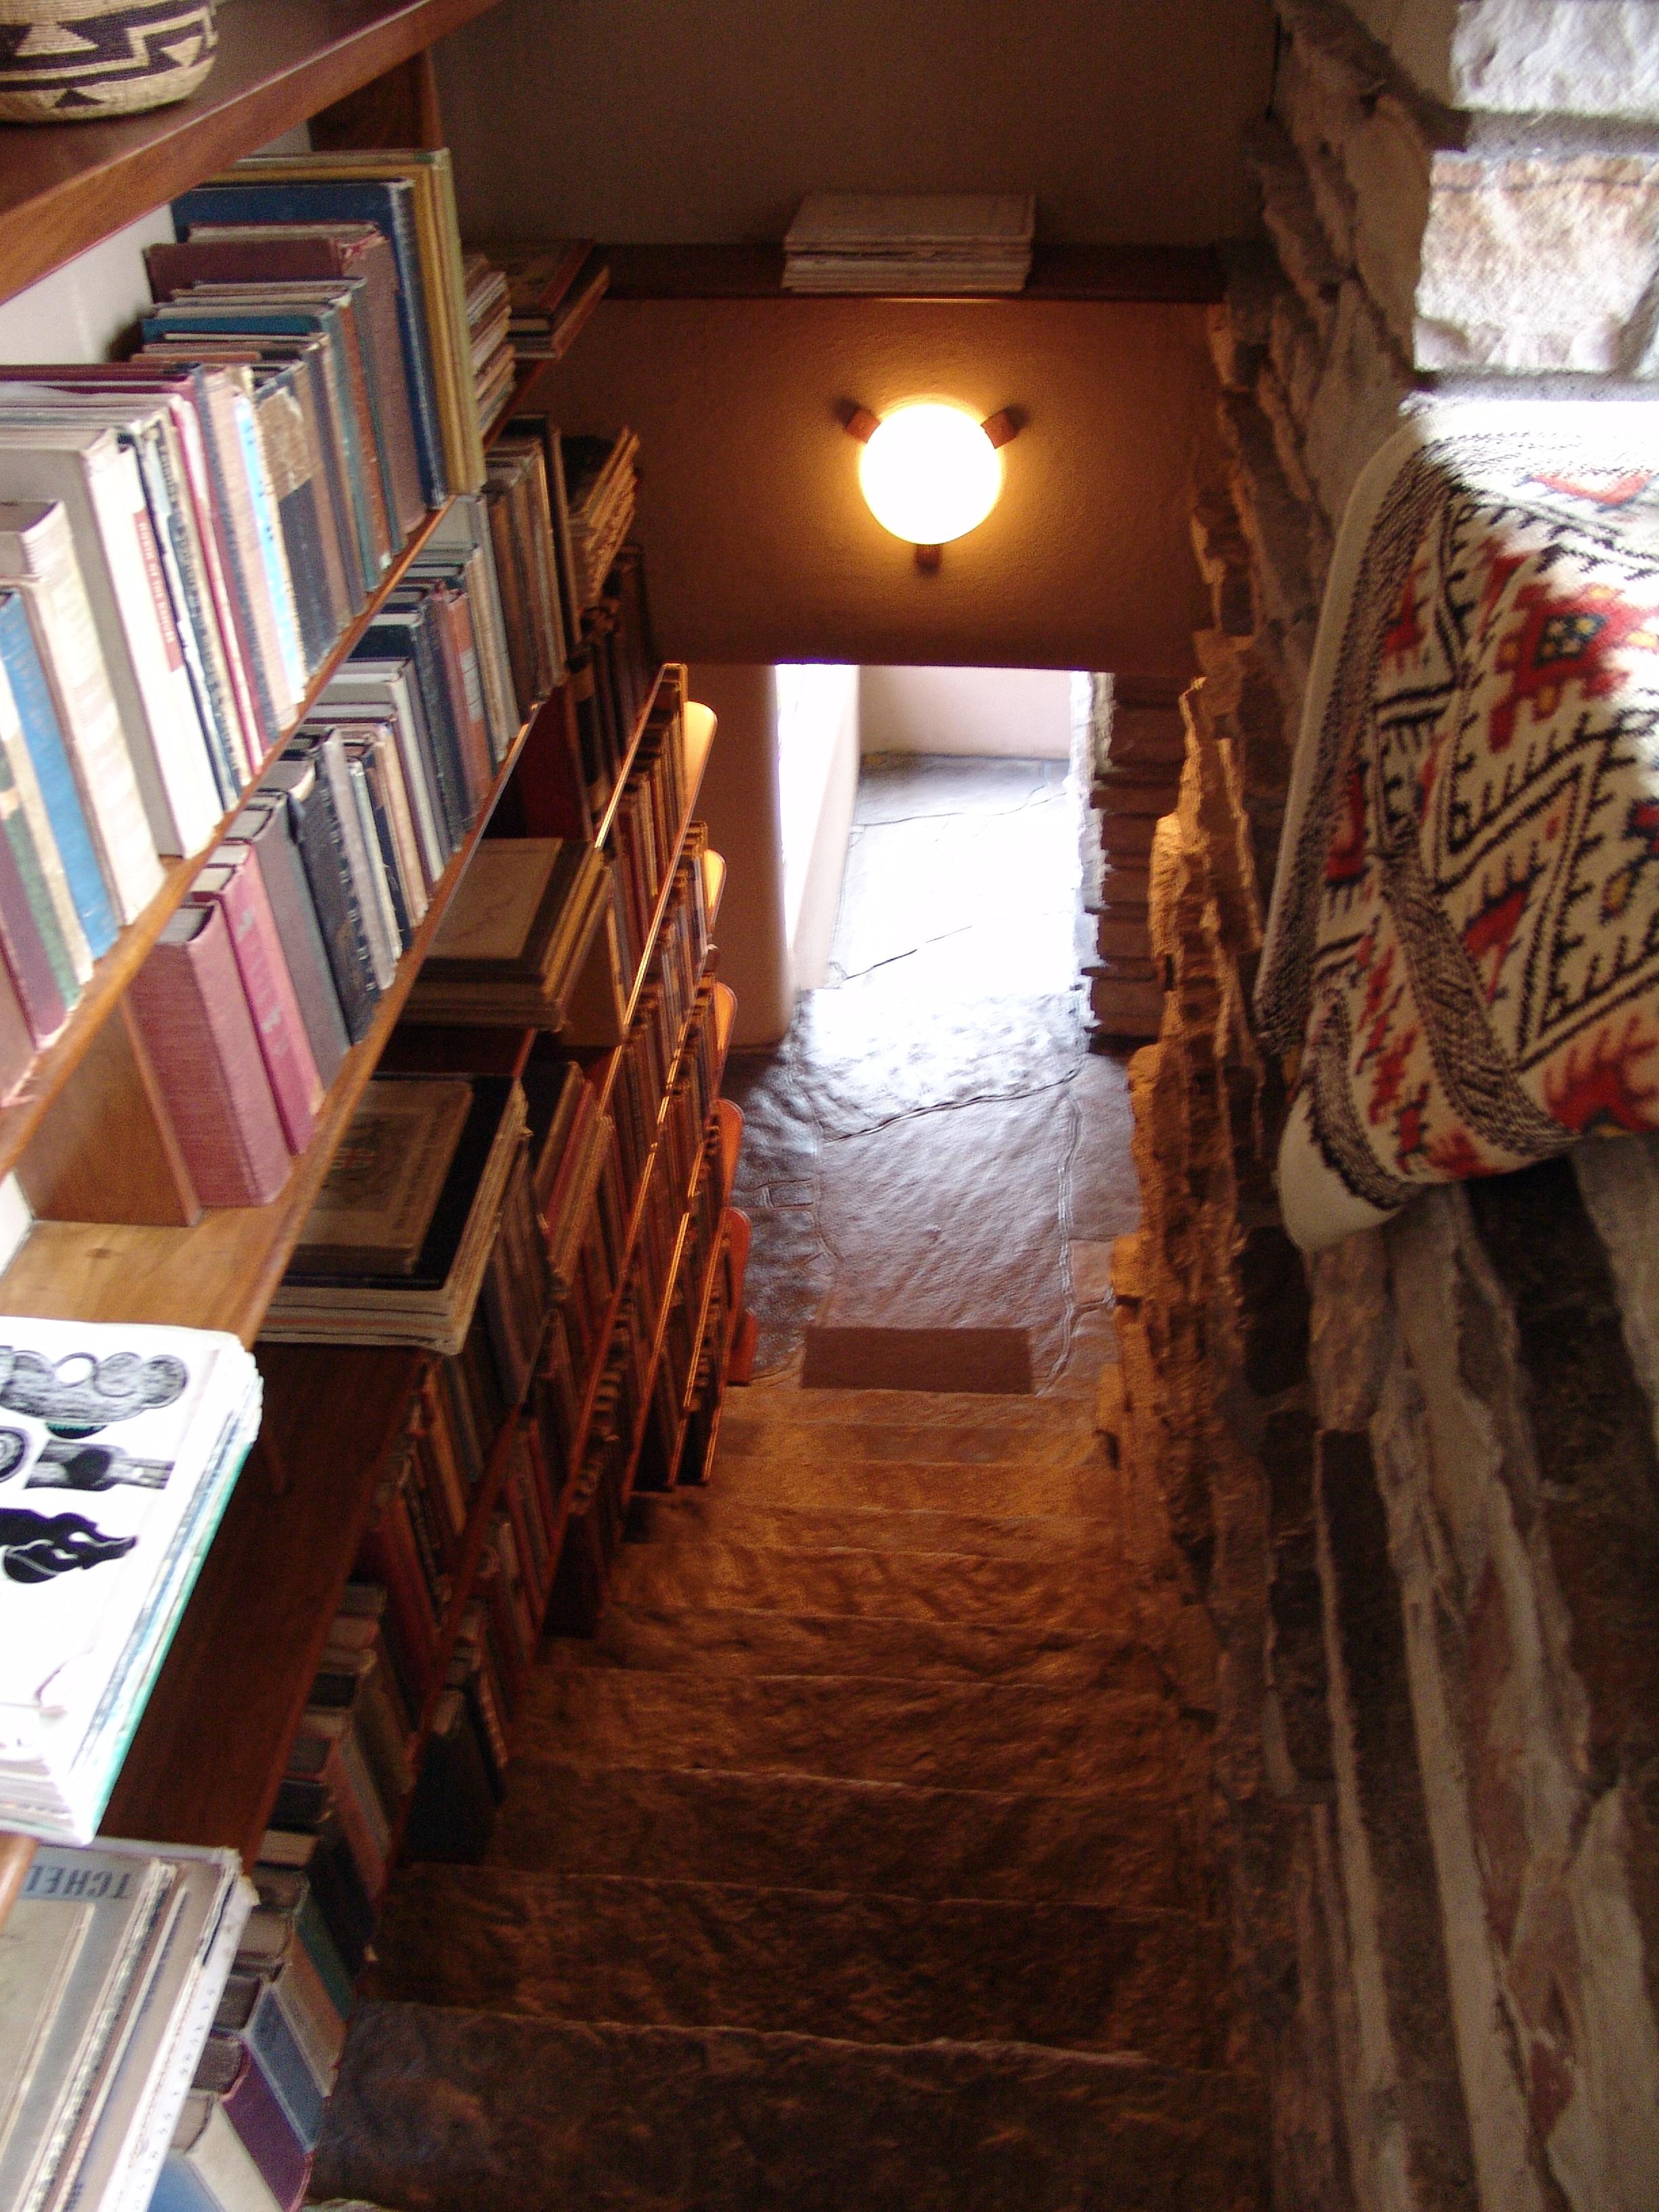 Fallingwater House Third Floor Stair With Bookshelves